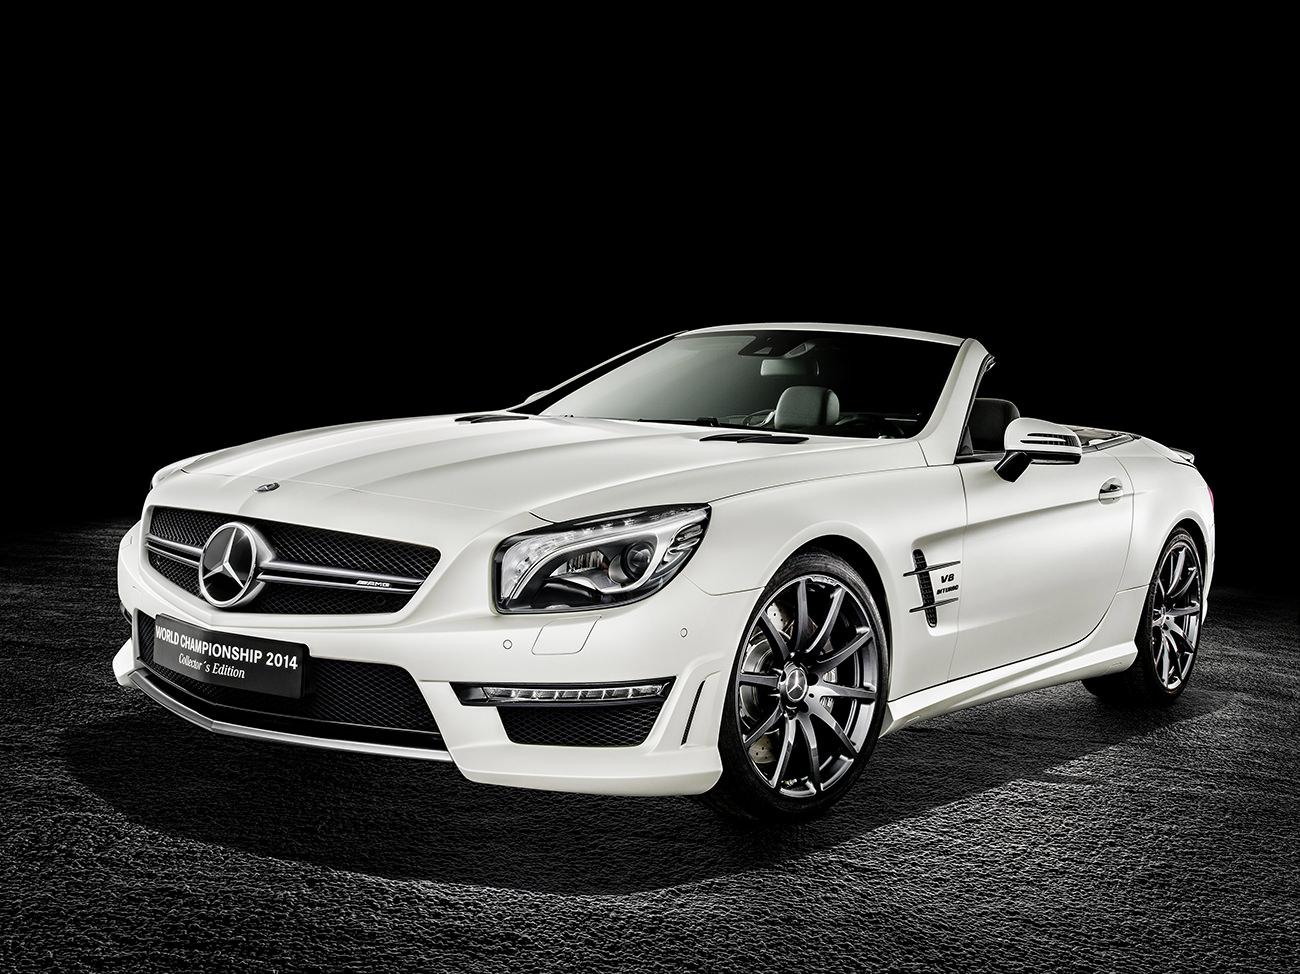 Mercedes-Benz-World-Championship-2014-Collector-Edition-3